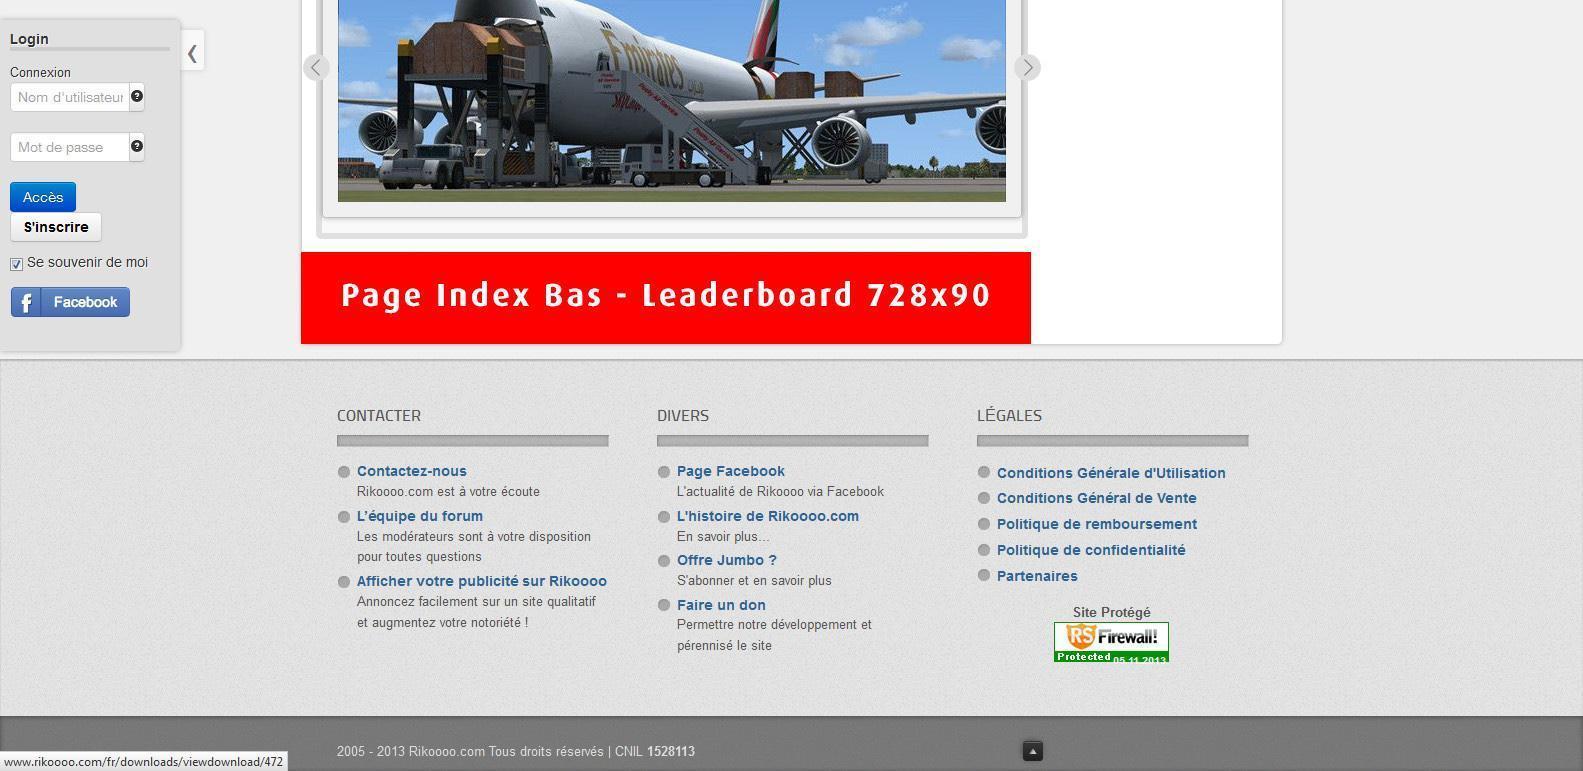 Accueil - Bas - Leaderboard 728x90